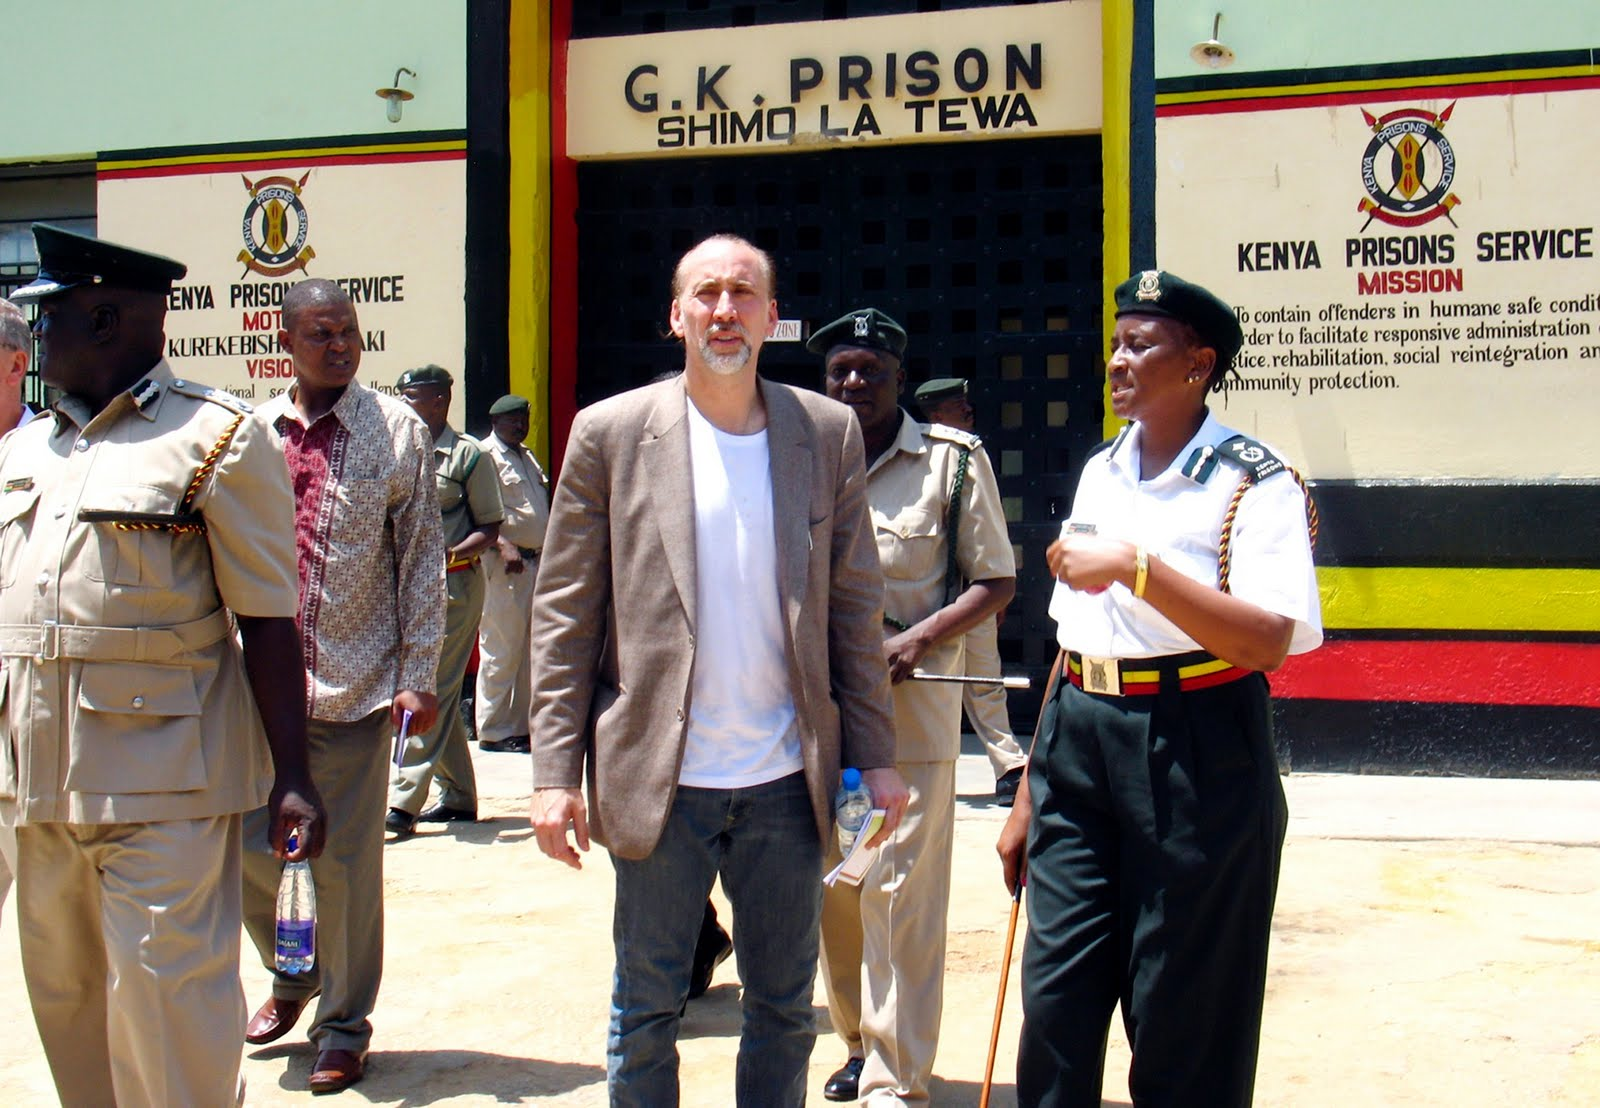 Hot Secrets: NICOLAS CAGE VISITS PIRATES IN KENYAN PRISON